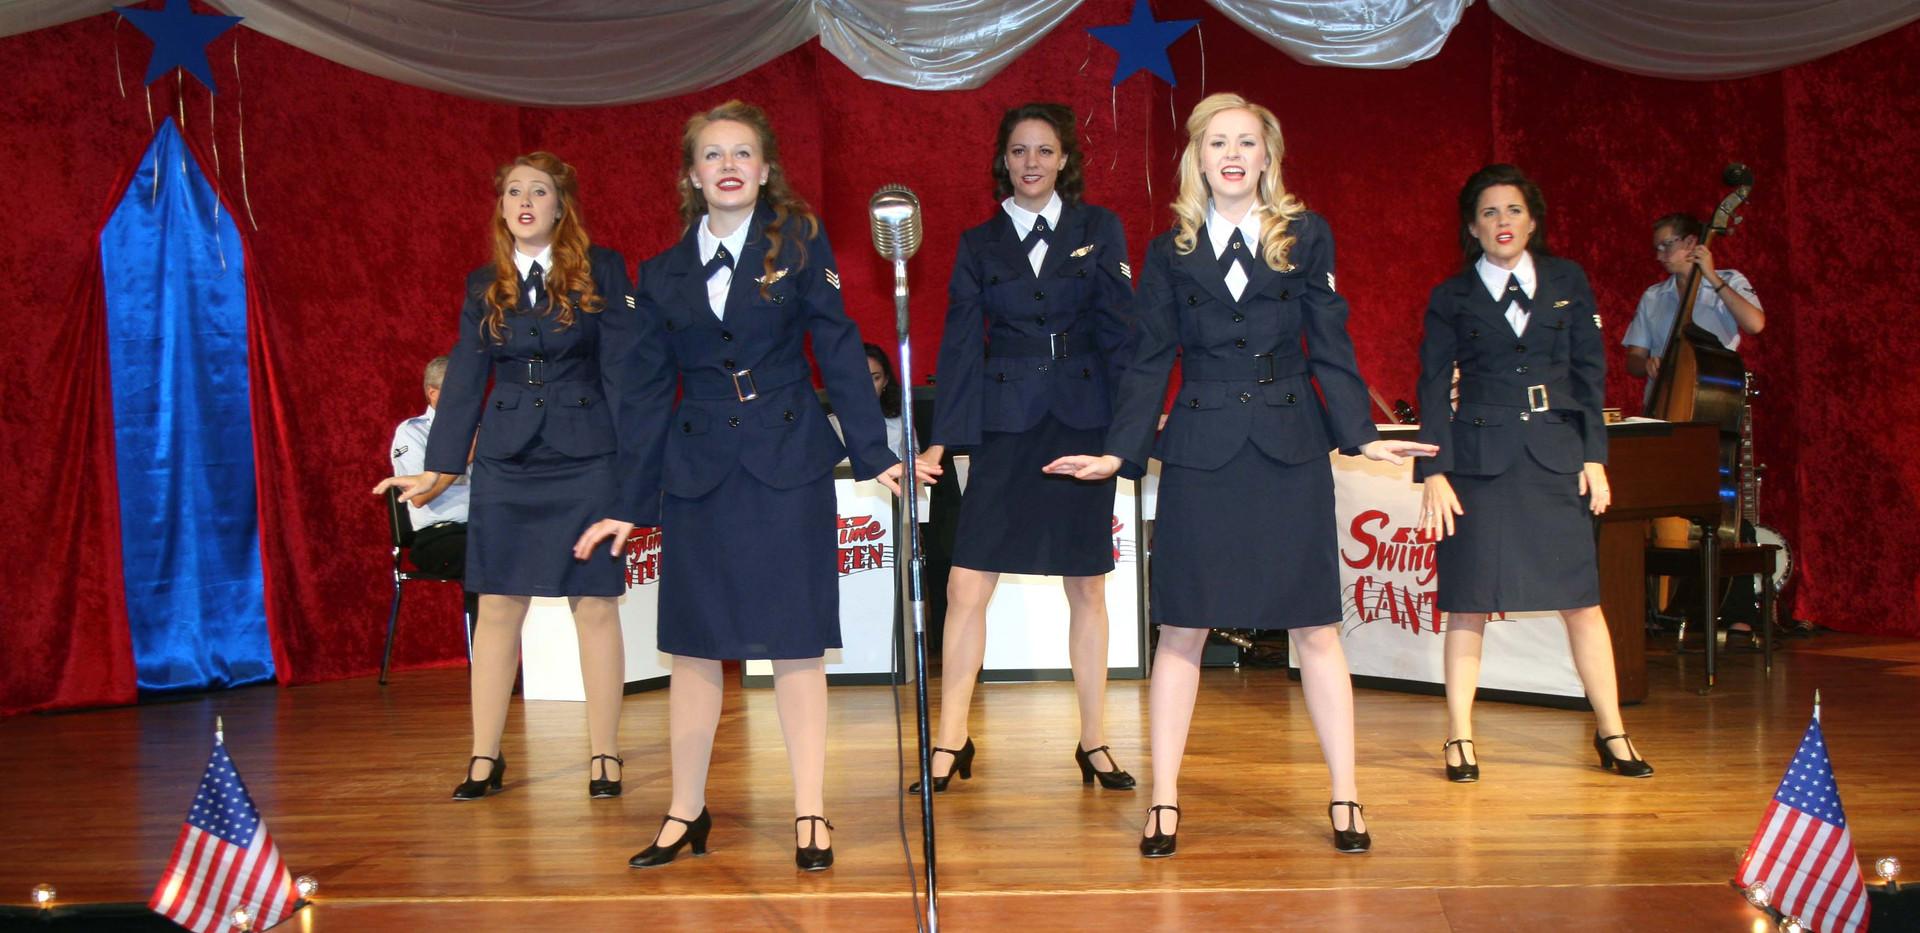 Swingtime Canteen - Uniforms